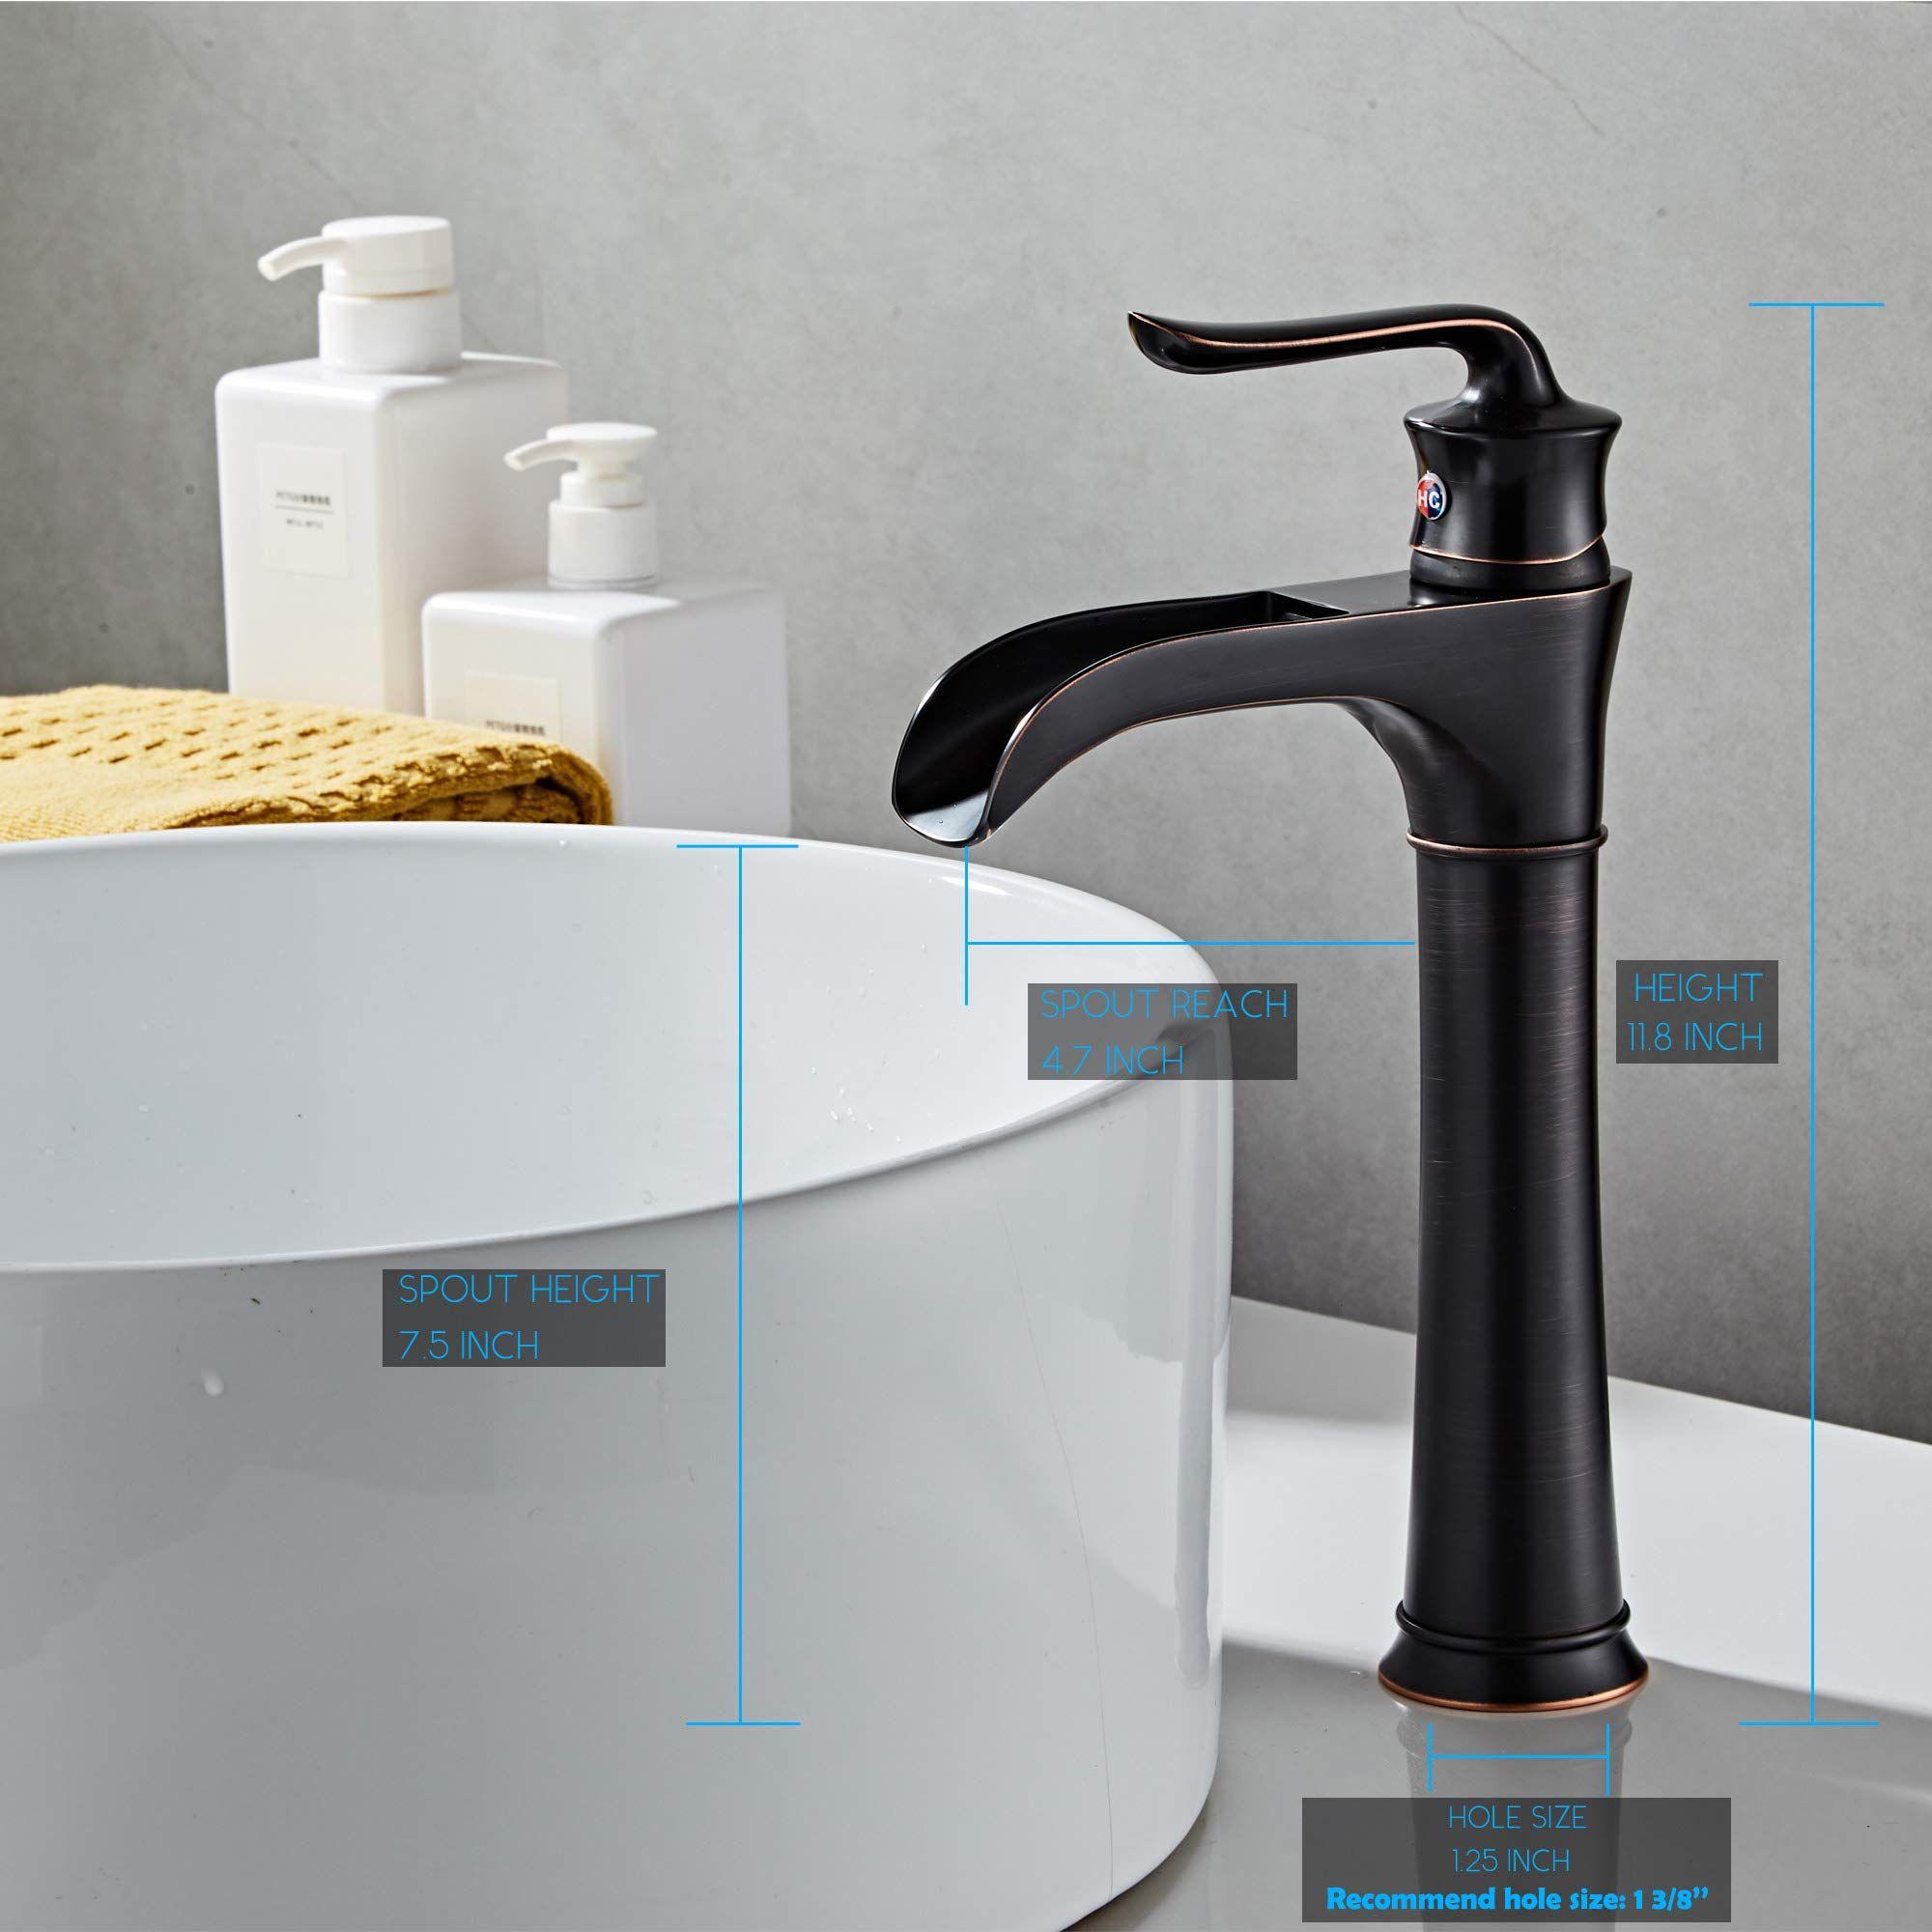 Farmhouse Waterfall Bathroom Faucet For Vessel Sink Single Hole Bowl Mixer Ta Bathroom Sink Faucets Single Hole Bathroom Faucets Waterfall Vessel Sink Bathroom